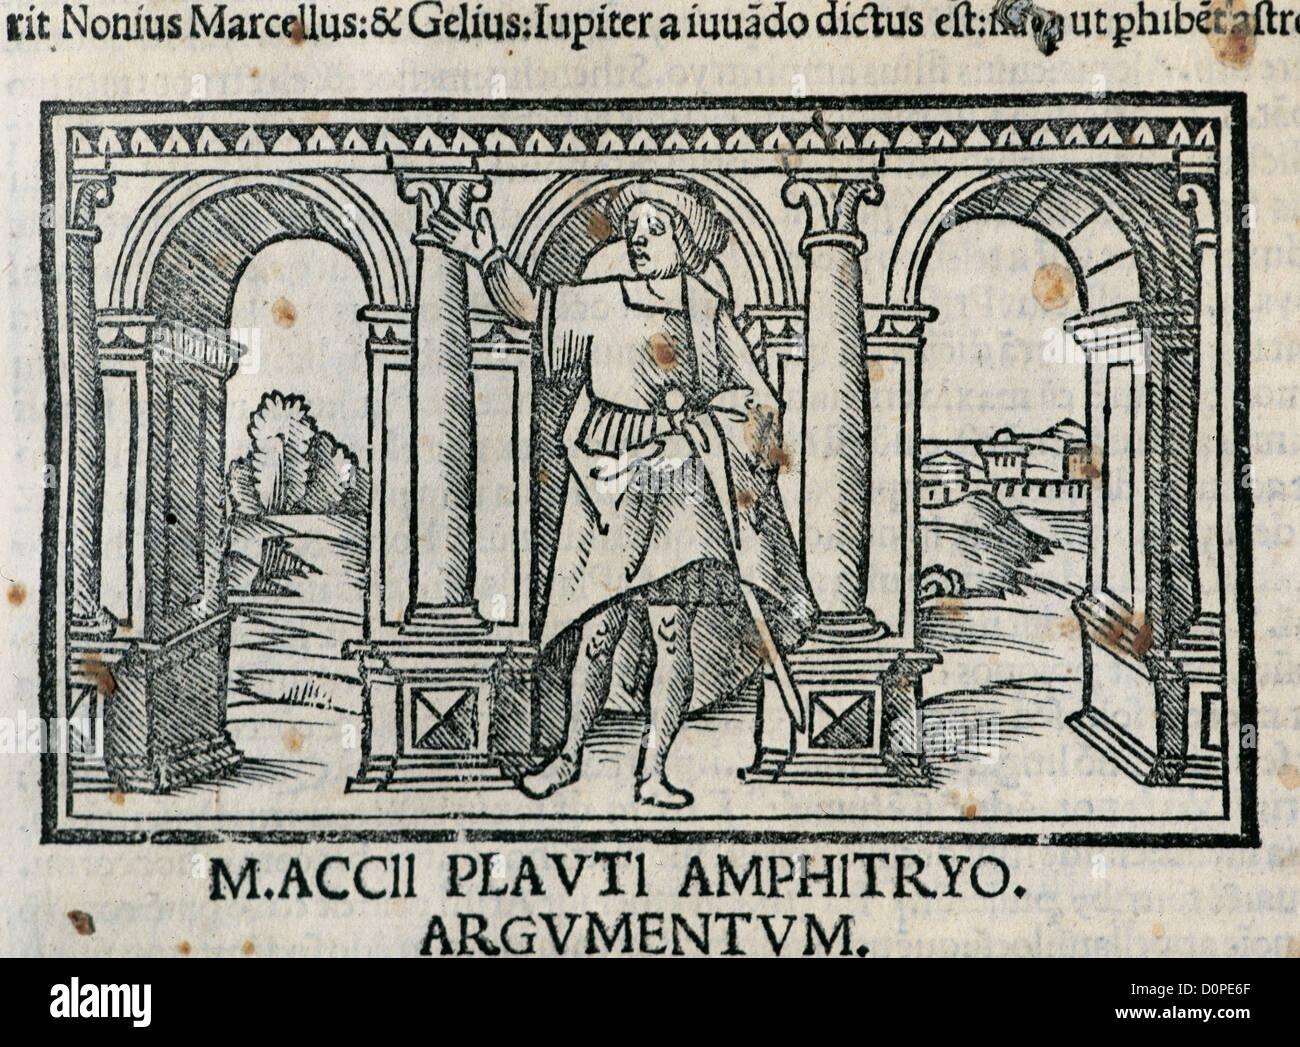 Titus Maccius Plautus 250 184 Dramaturge Latin L Hote Amphitryo